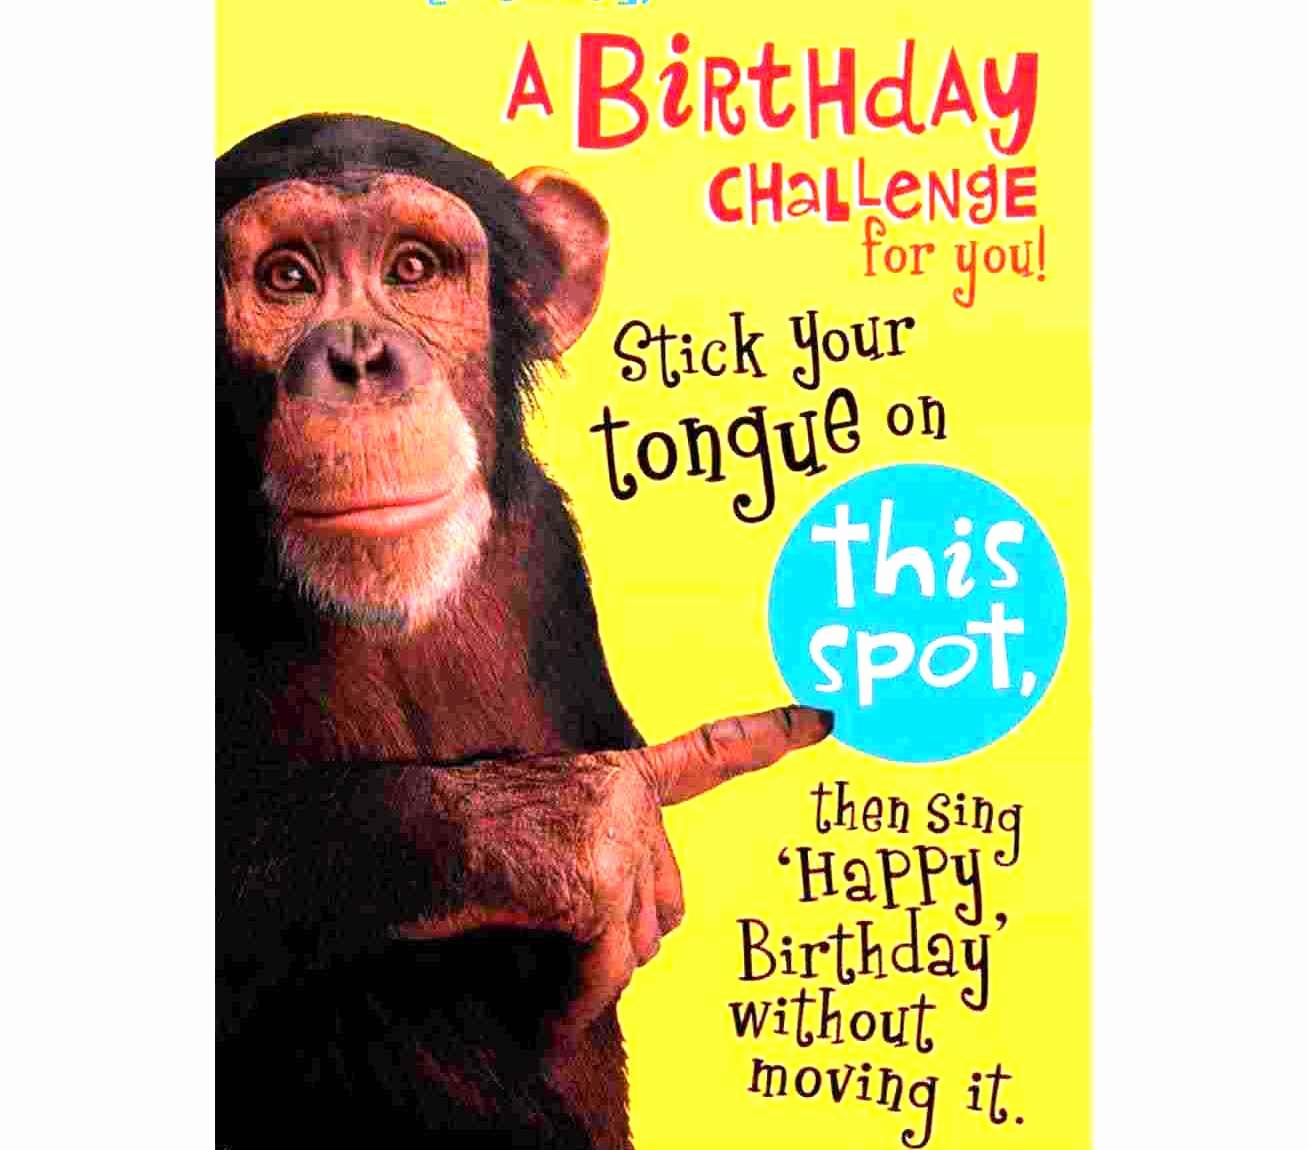 Funny Printable Birthday Cards Luxury Free Printable Funny Birthday Cards for Men Template